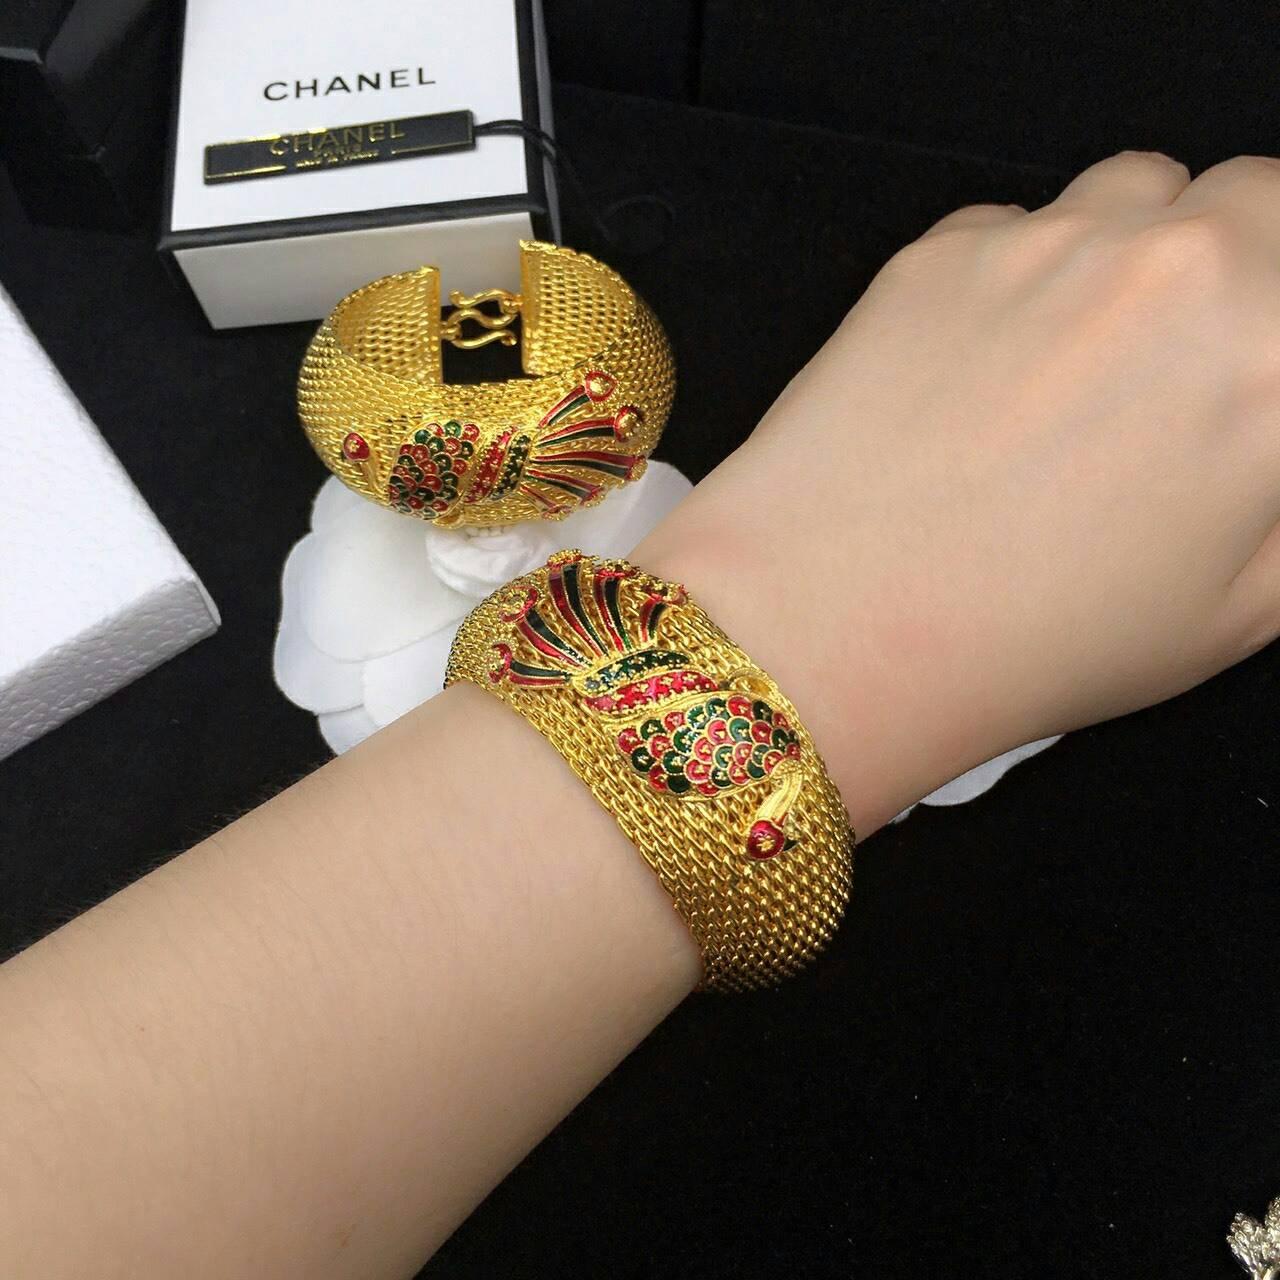 Gold Bracelet ลายนกยูงลงยาสวยฝุดๆ ตะขอแข็งแรงอย่างดี ตัวเรือนสีทองชุบ 5 ไมครอน